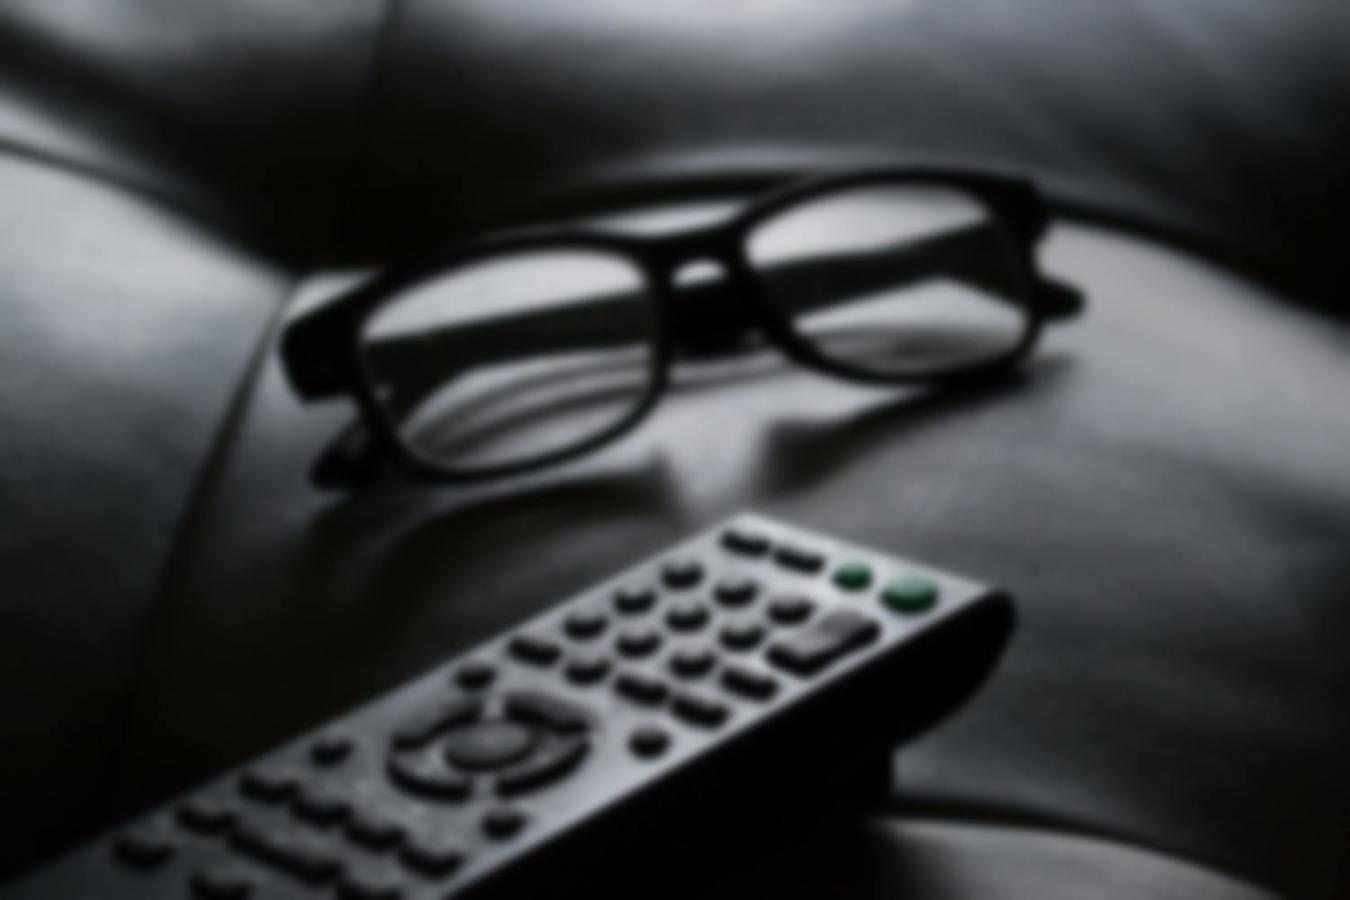 Exodus from Pay TV Accelerates Despite OTT Partnerships